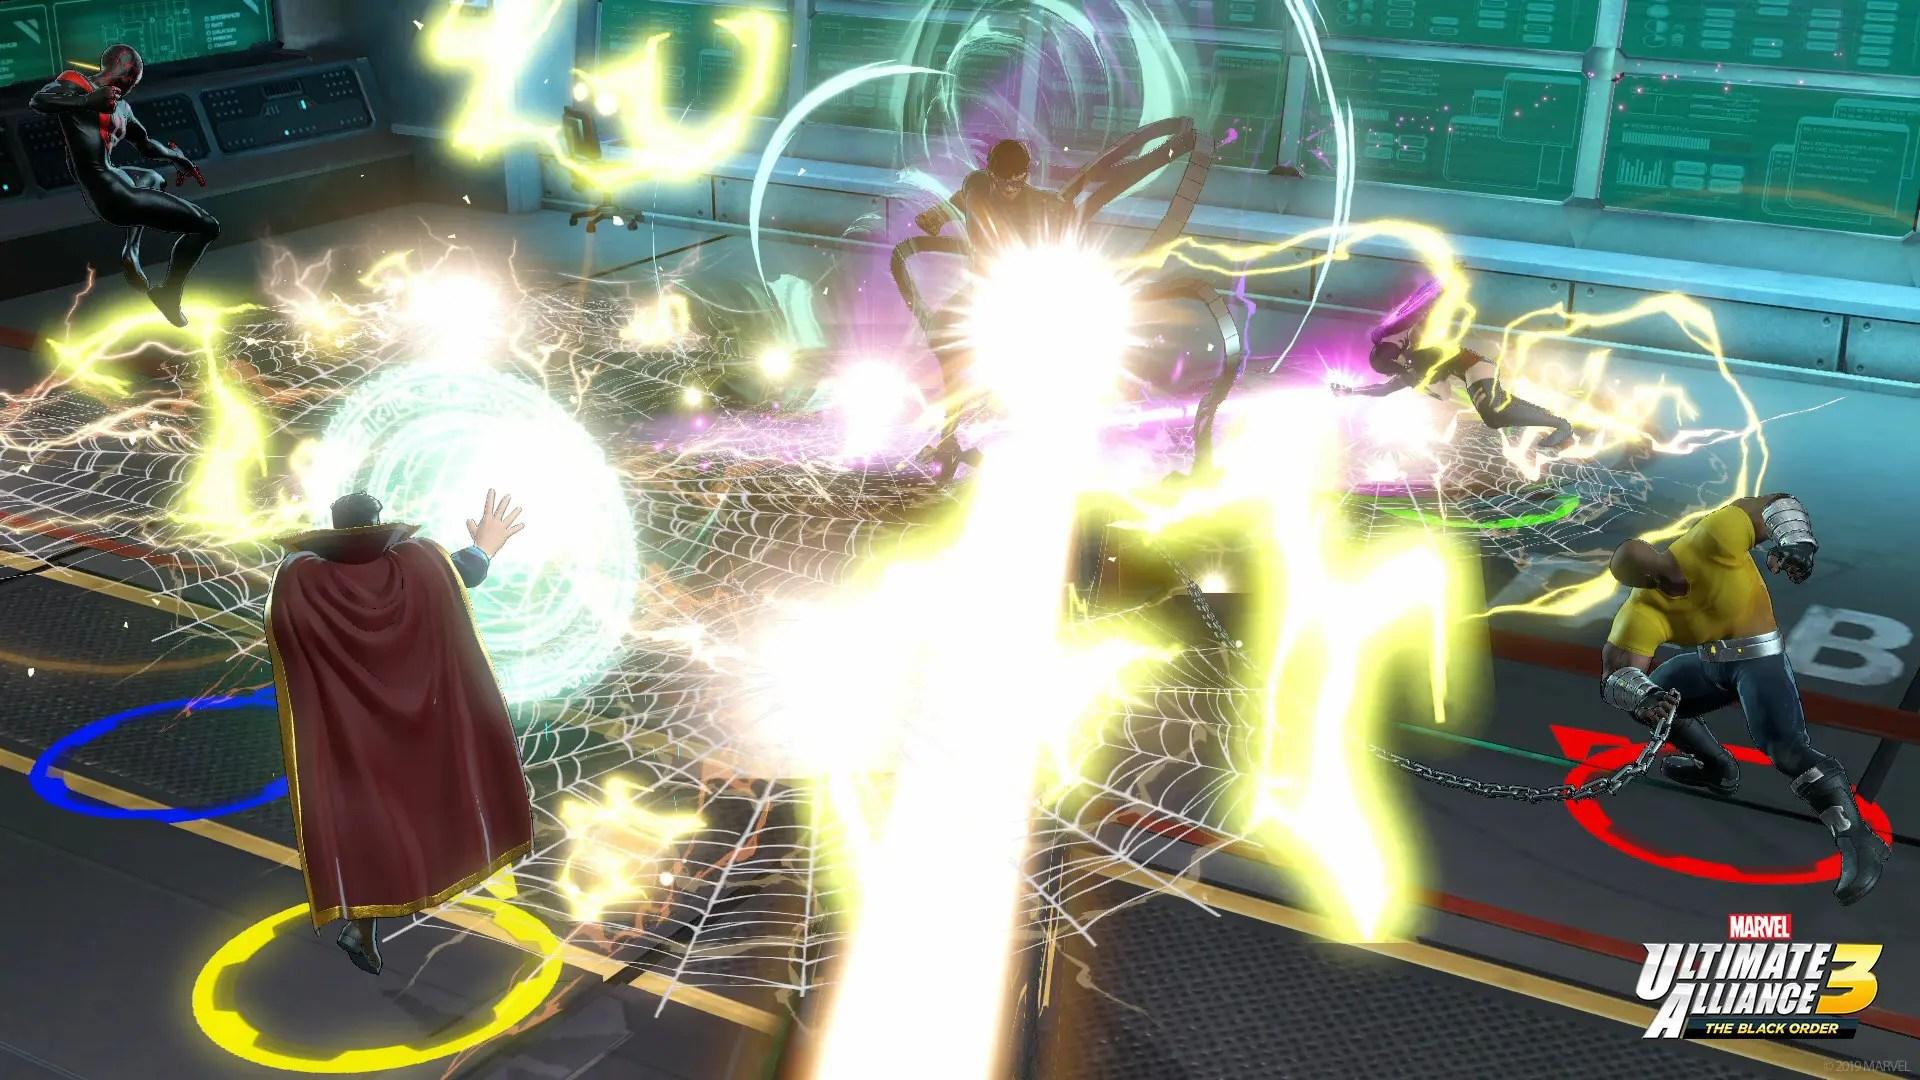 Marvel Ultimate Alliance 3: The Black Order E3 2019 Screenshot 6